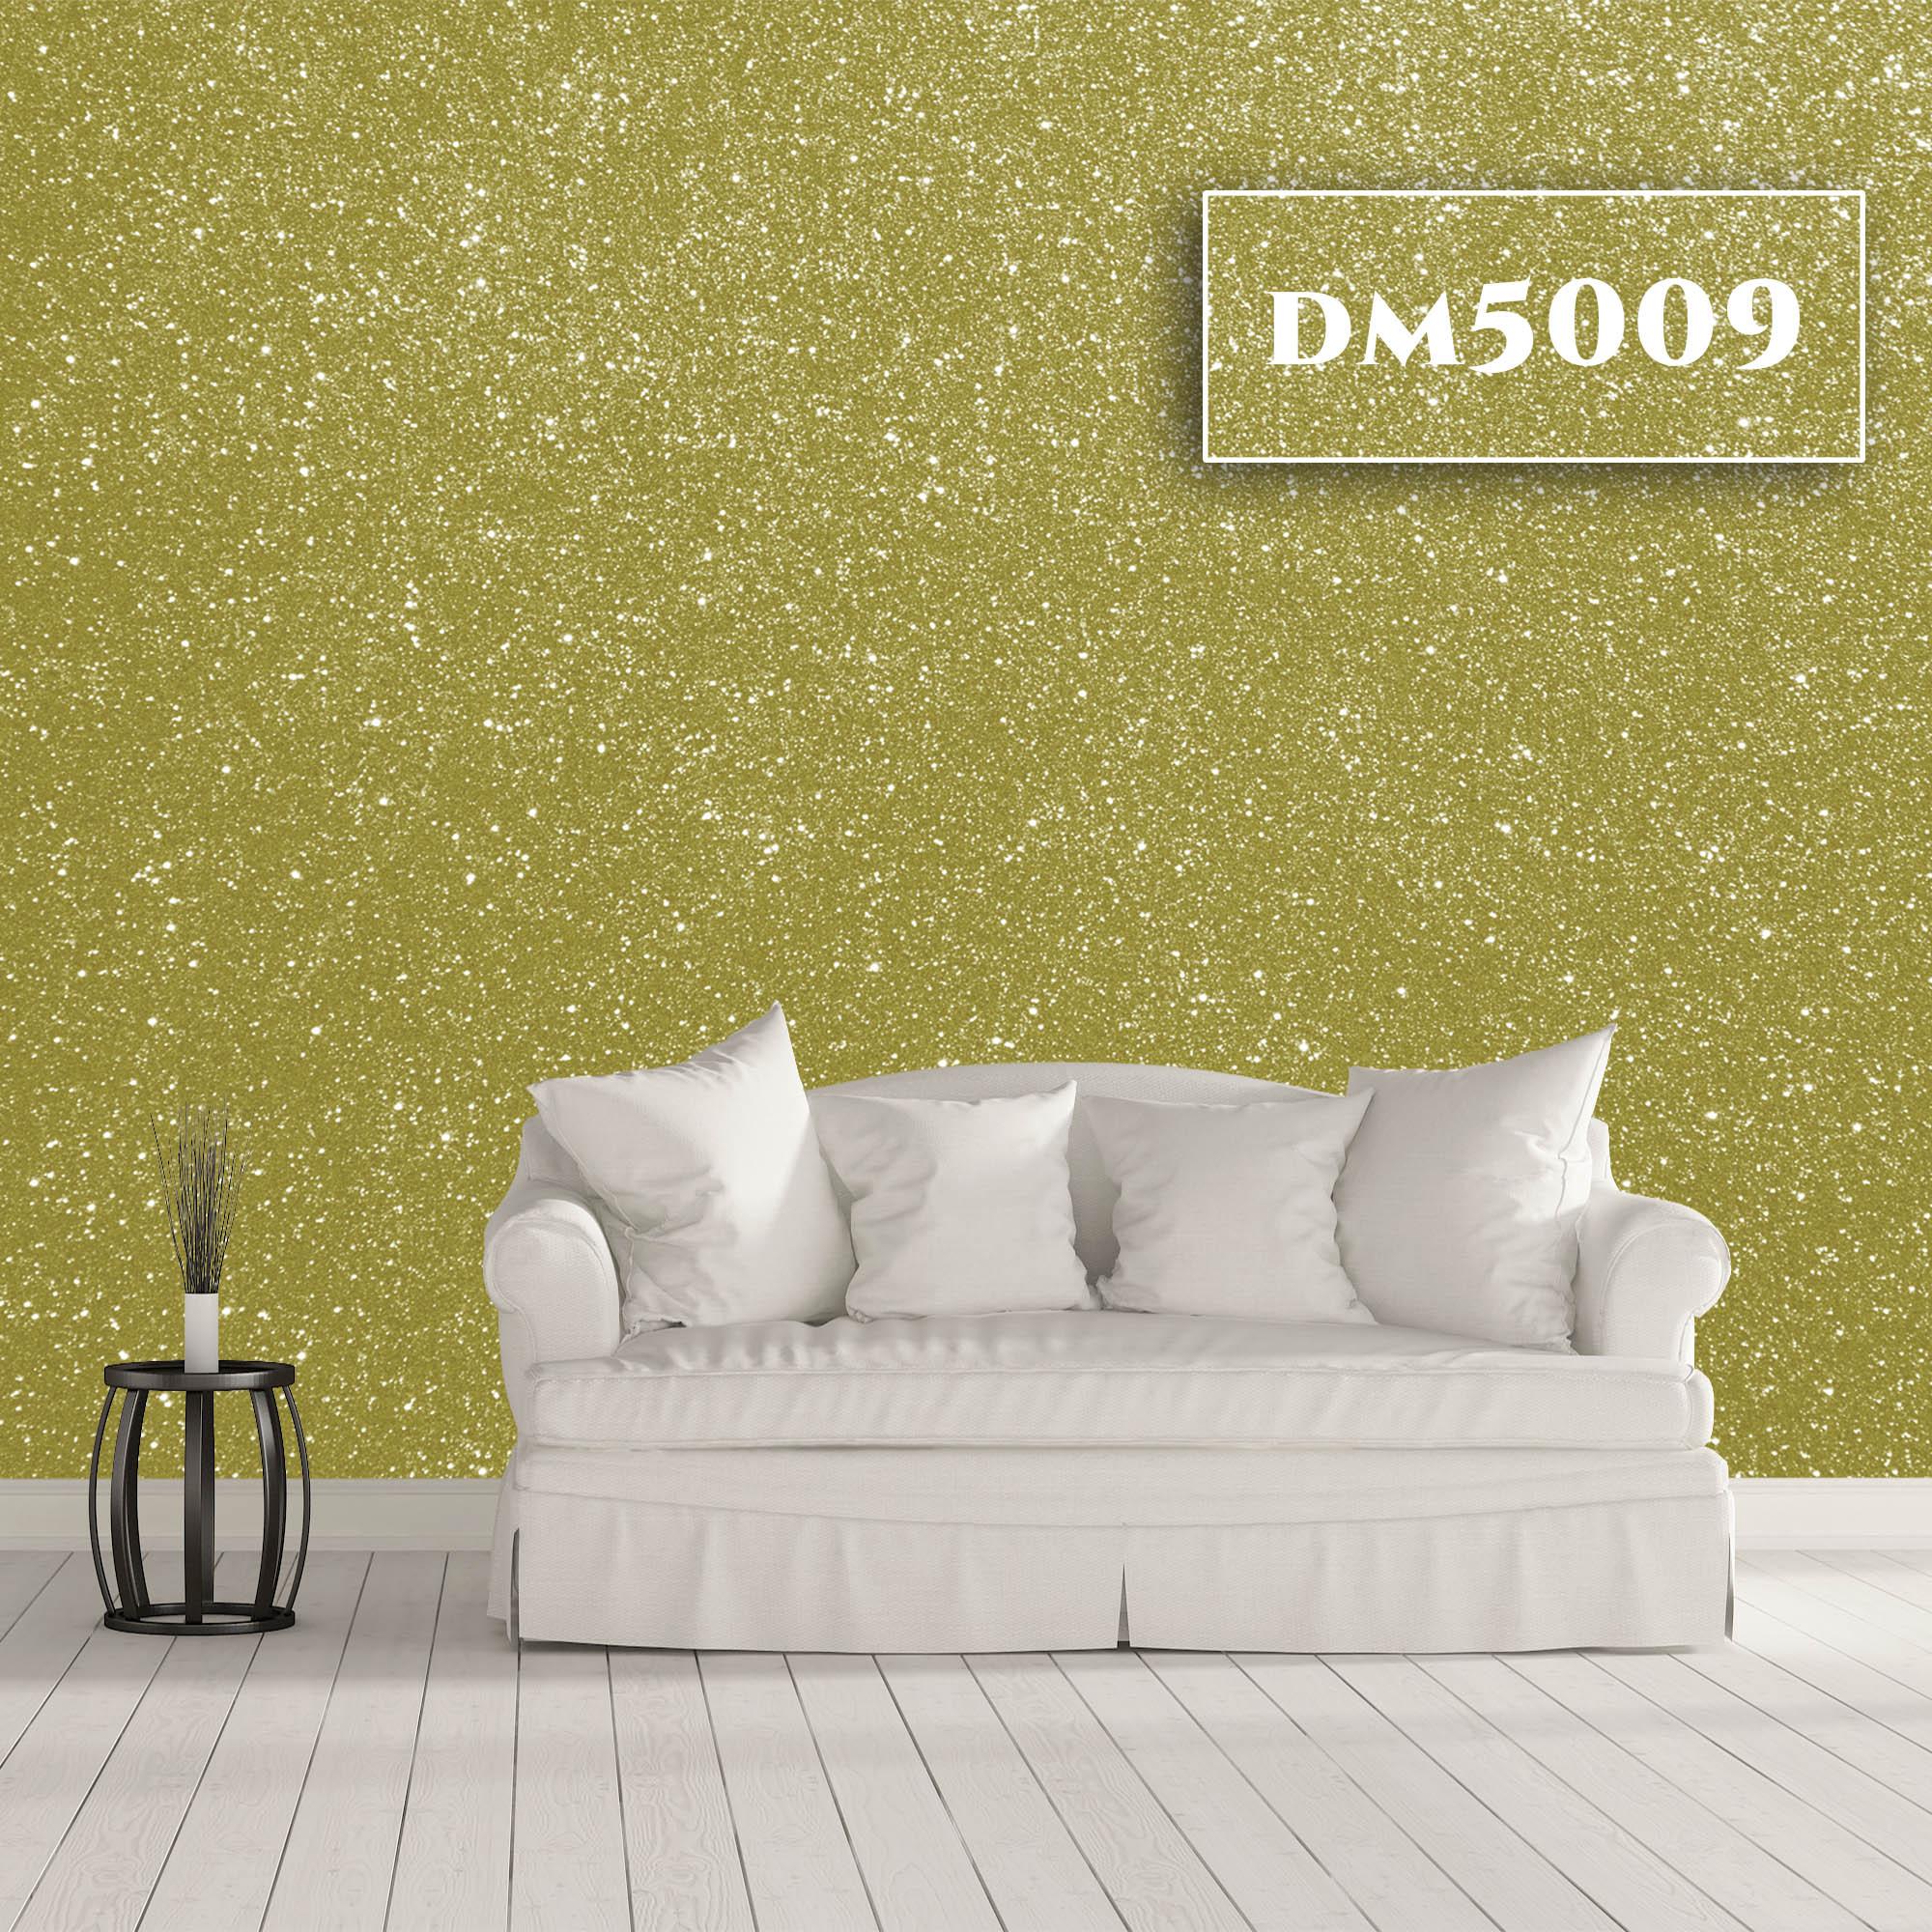 DM5009